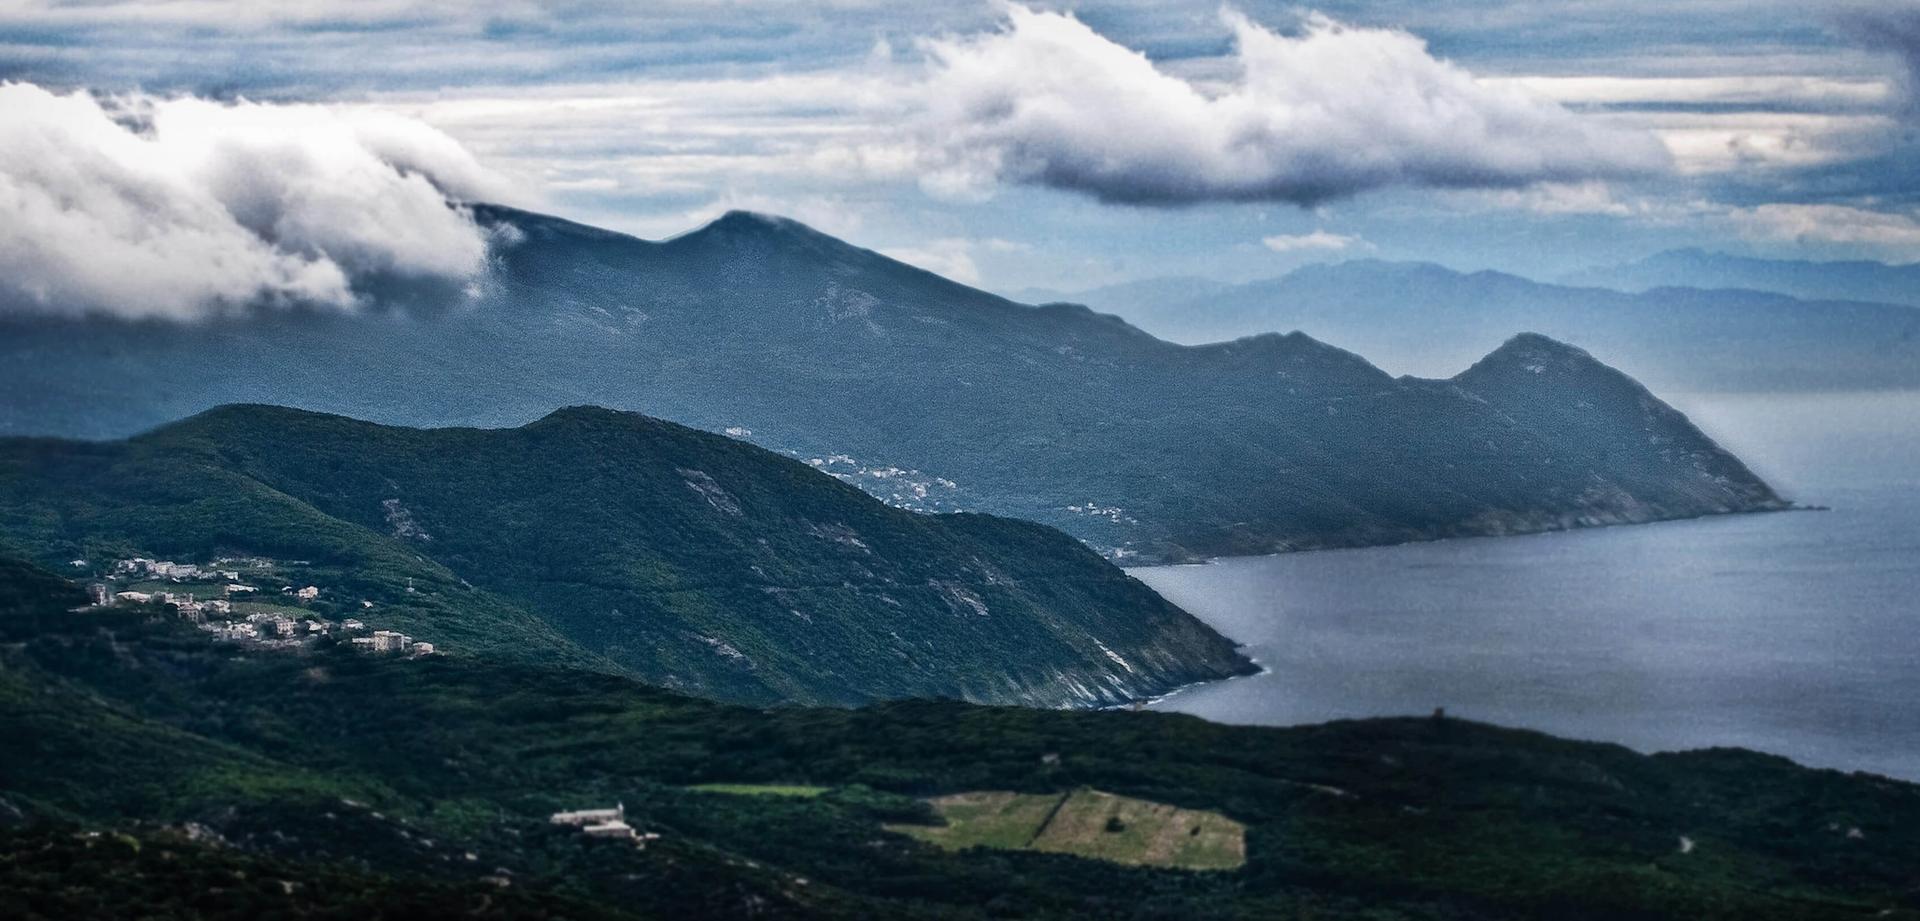 Korsika, Landscape, 2011, Island, Corse, France, Road Trippin